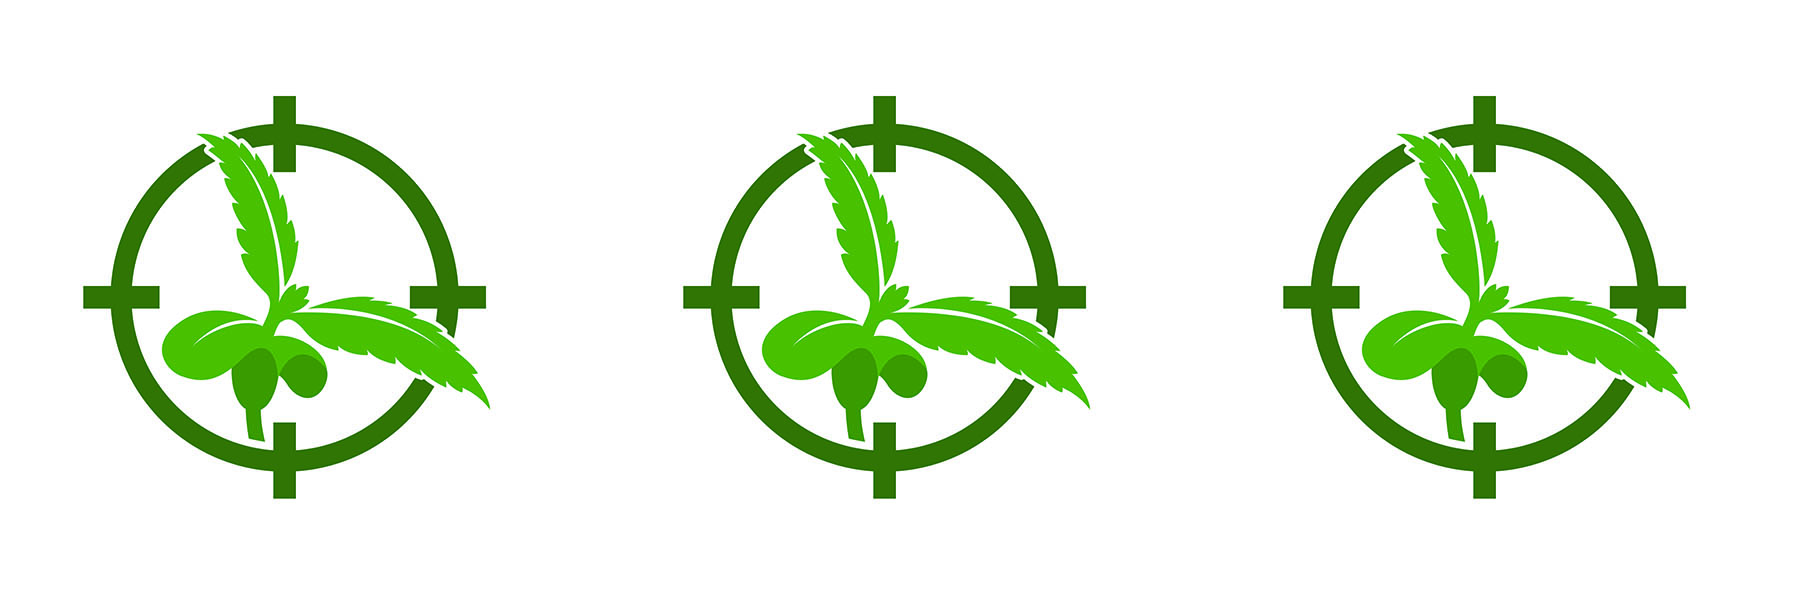 NZ Target Leaf.jpg